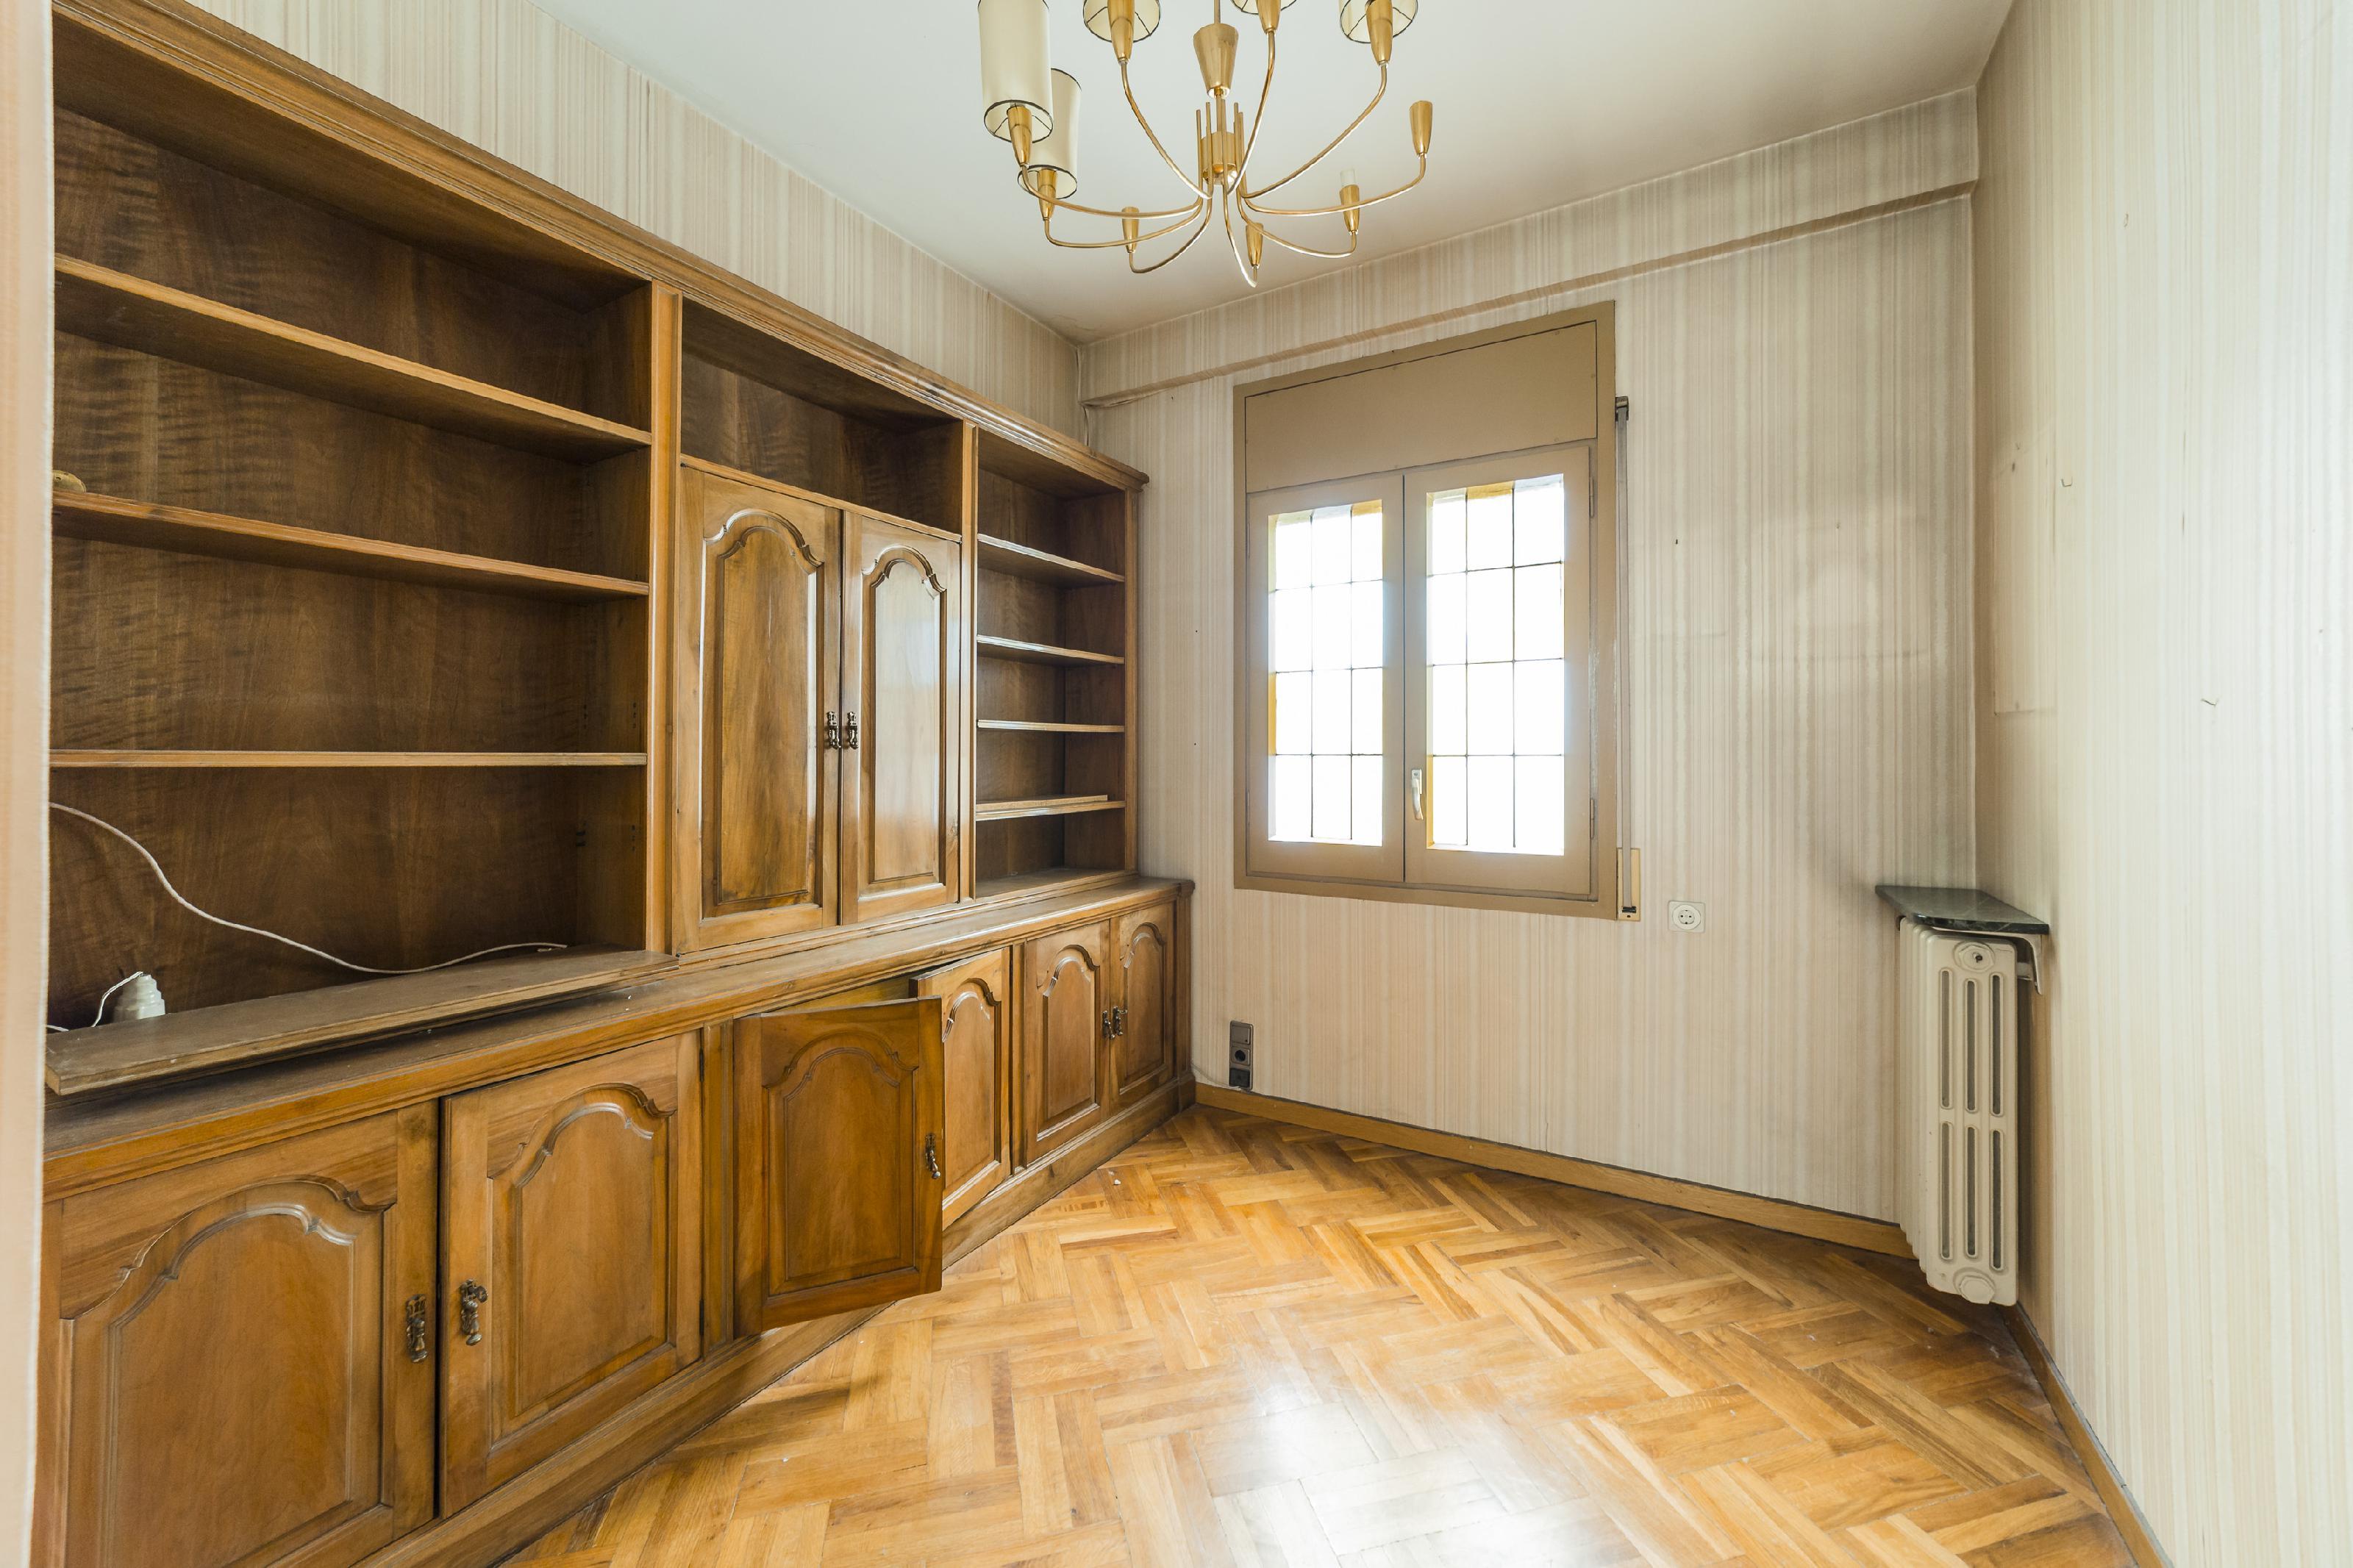 249314 Penthouse for sale in Sarrià-Sant Gervasi, Sant Gervasi-Galvany 24